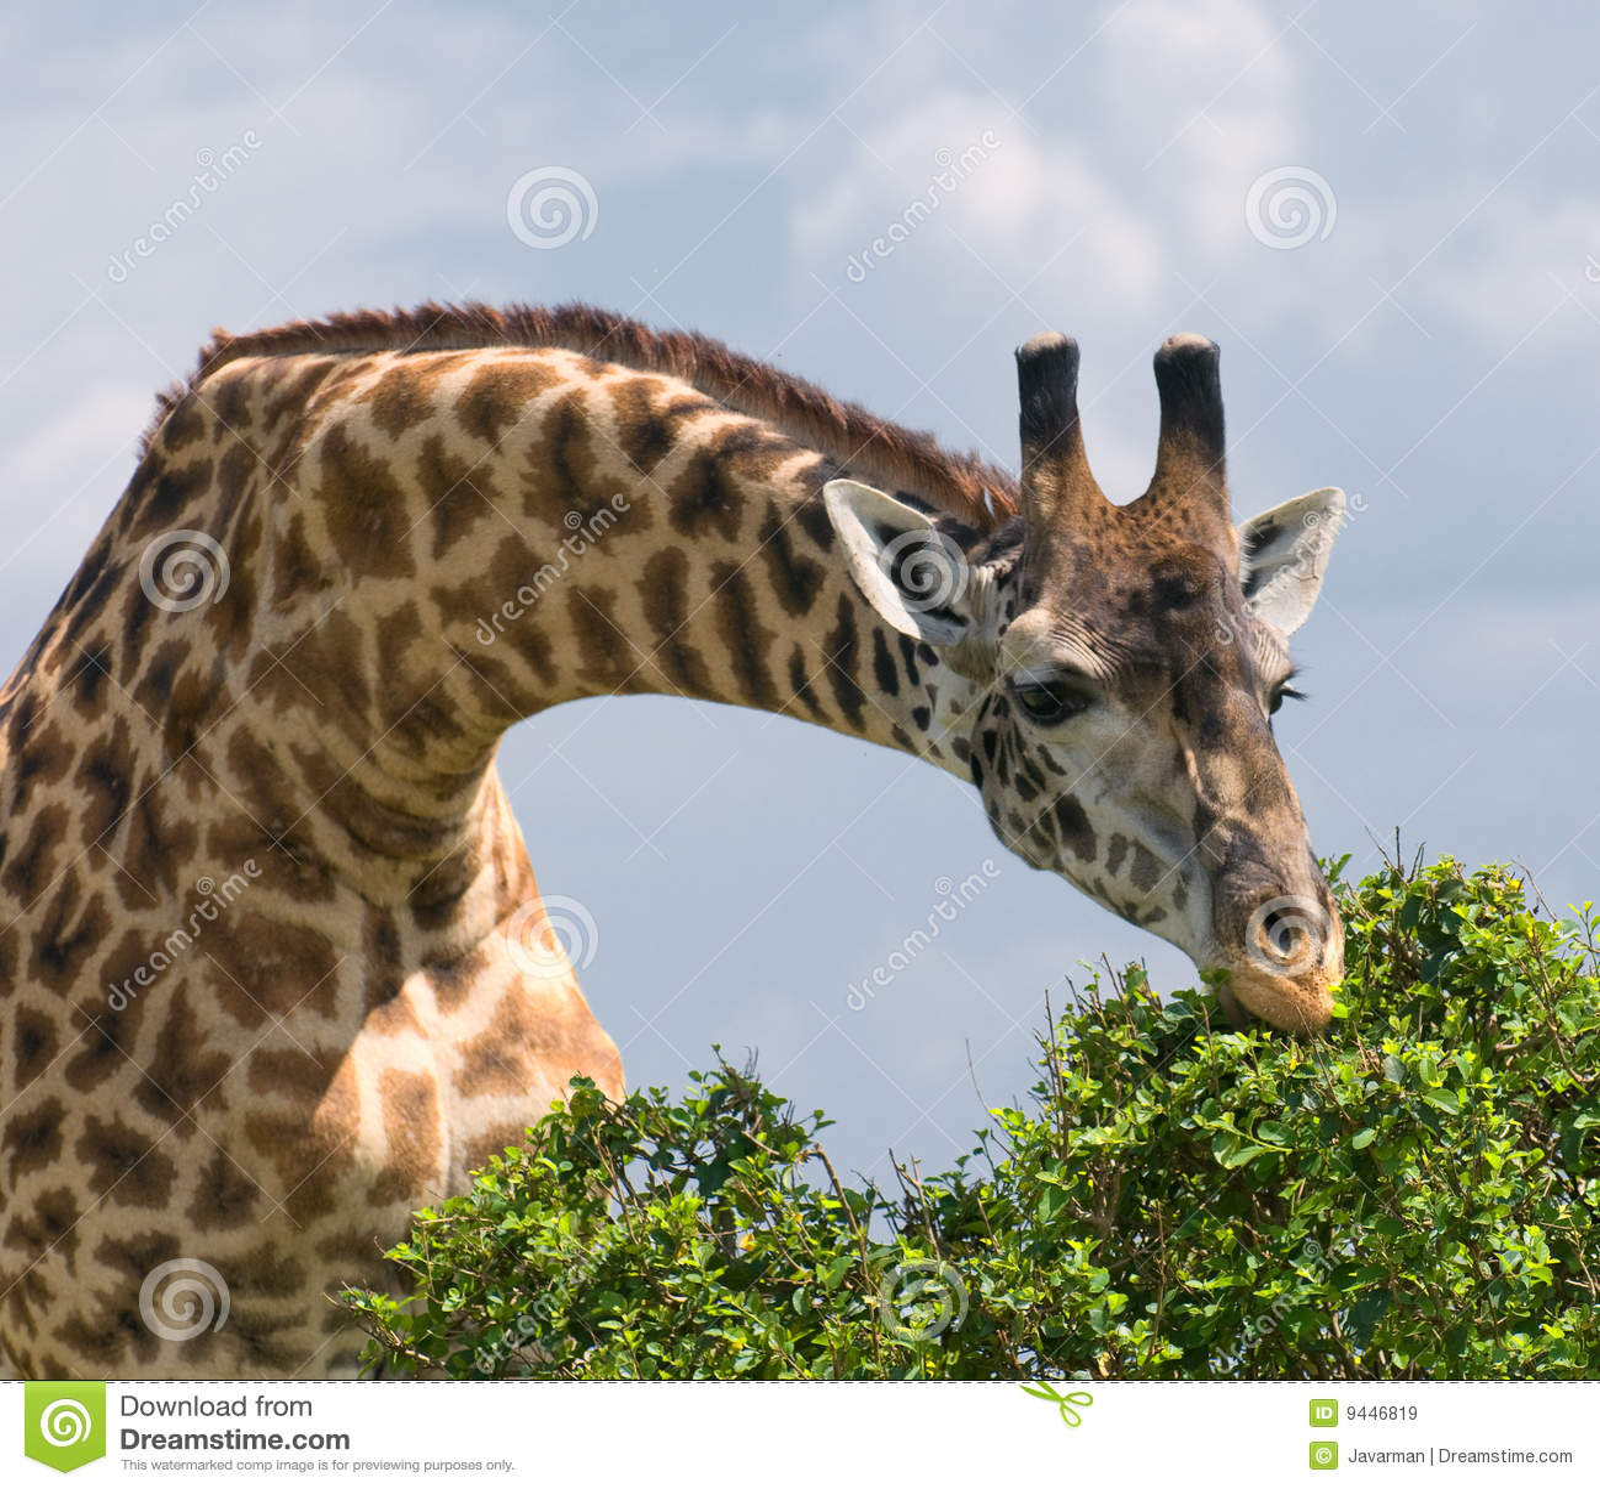 Giraffe and a tree, african wildlife, safari